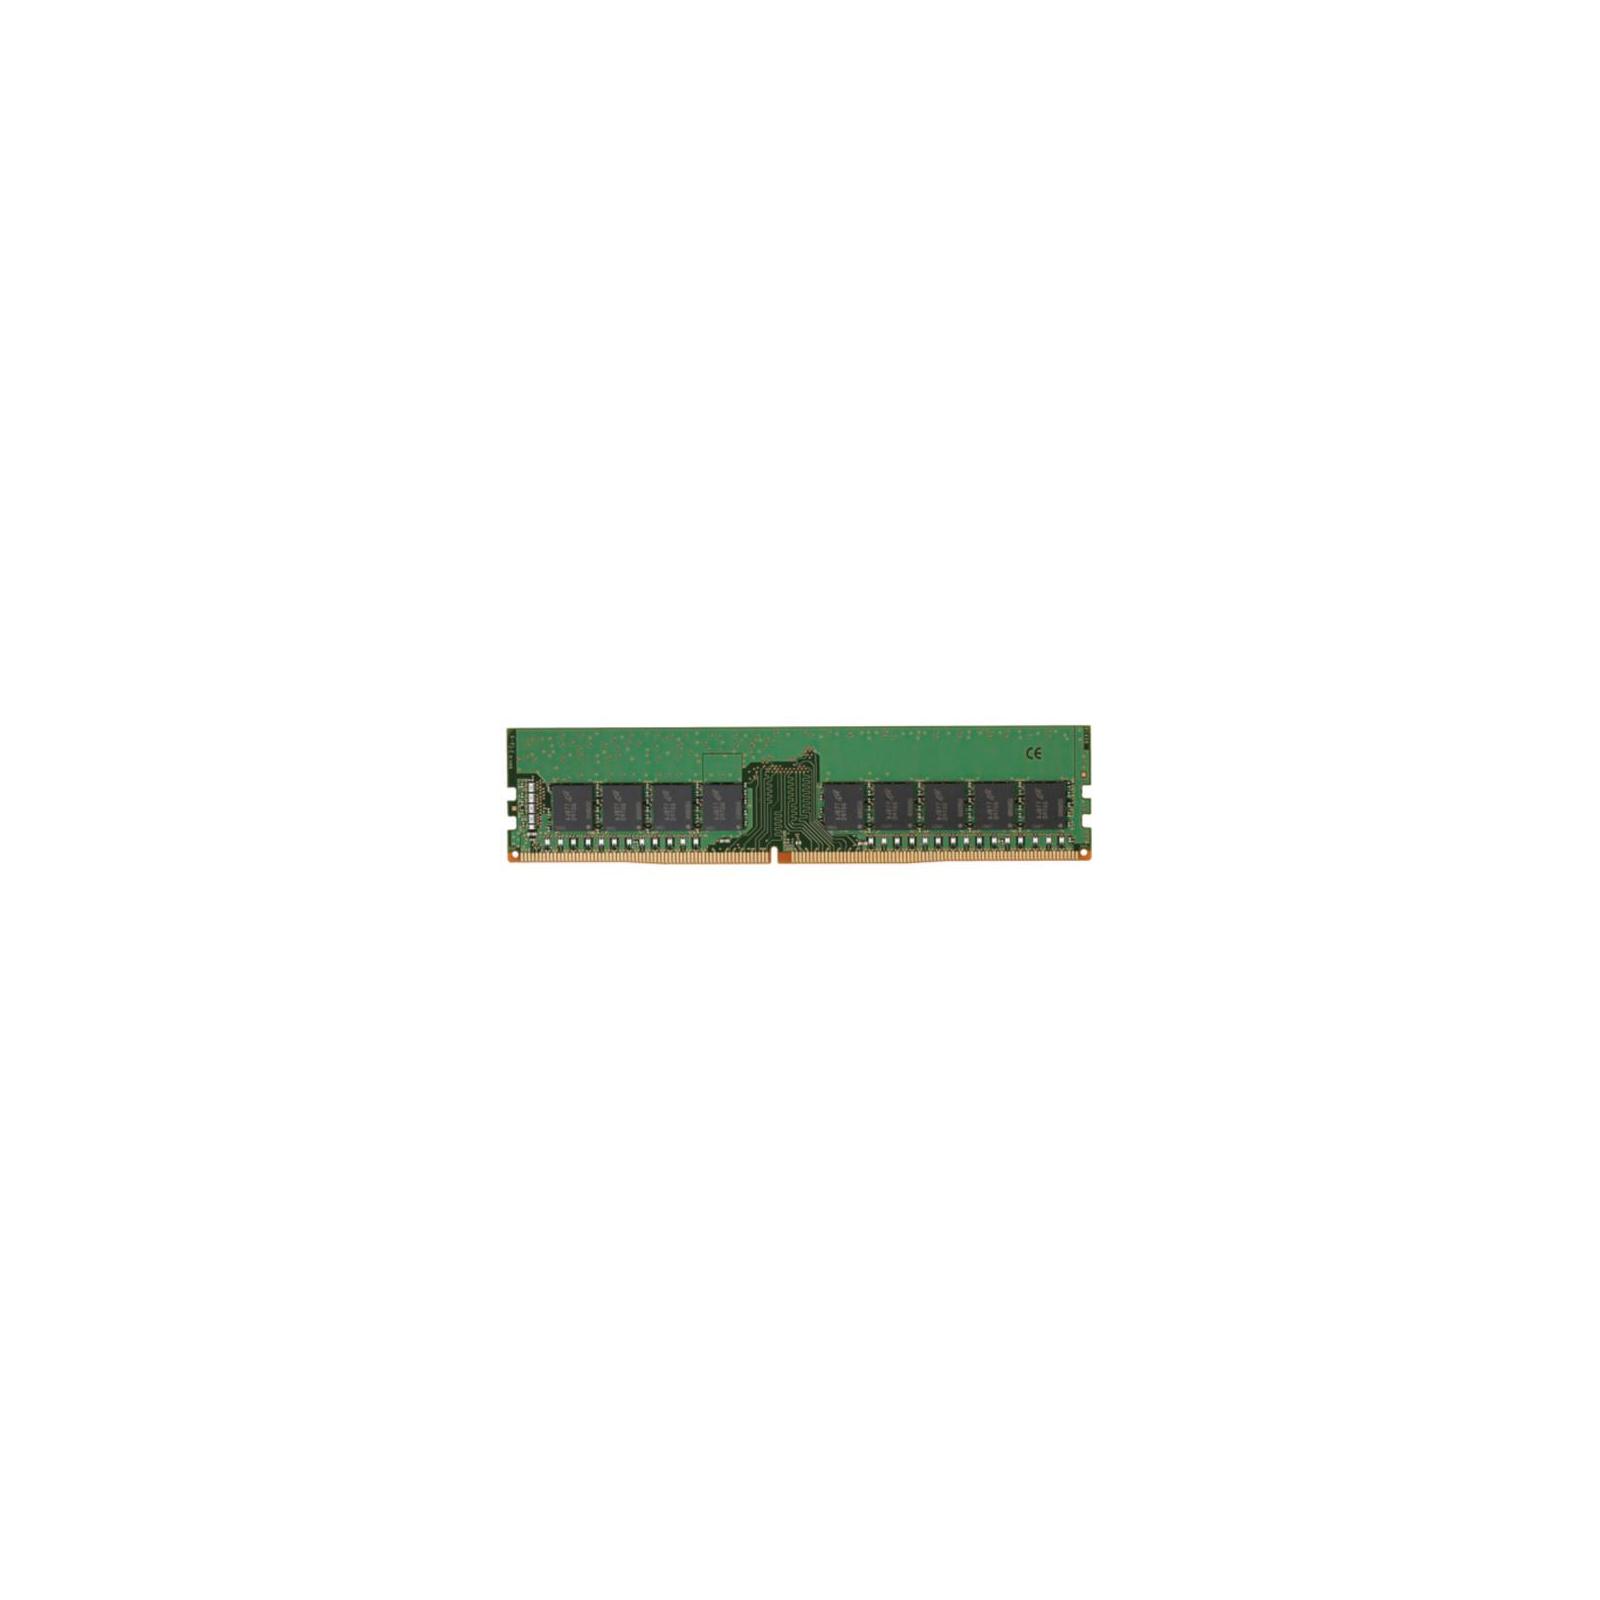 Модуль памяти для сервера DDR4 16GB ECC UDIMM 2400MHz 2Rx8 1.2V CL17 Kingston (KSM24ED8/16ME) изображение 2